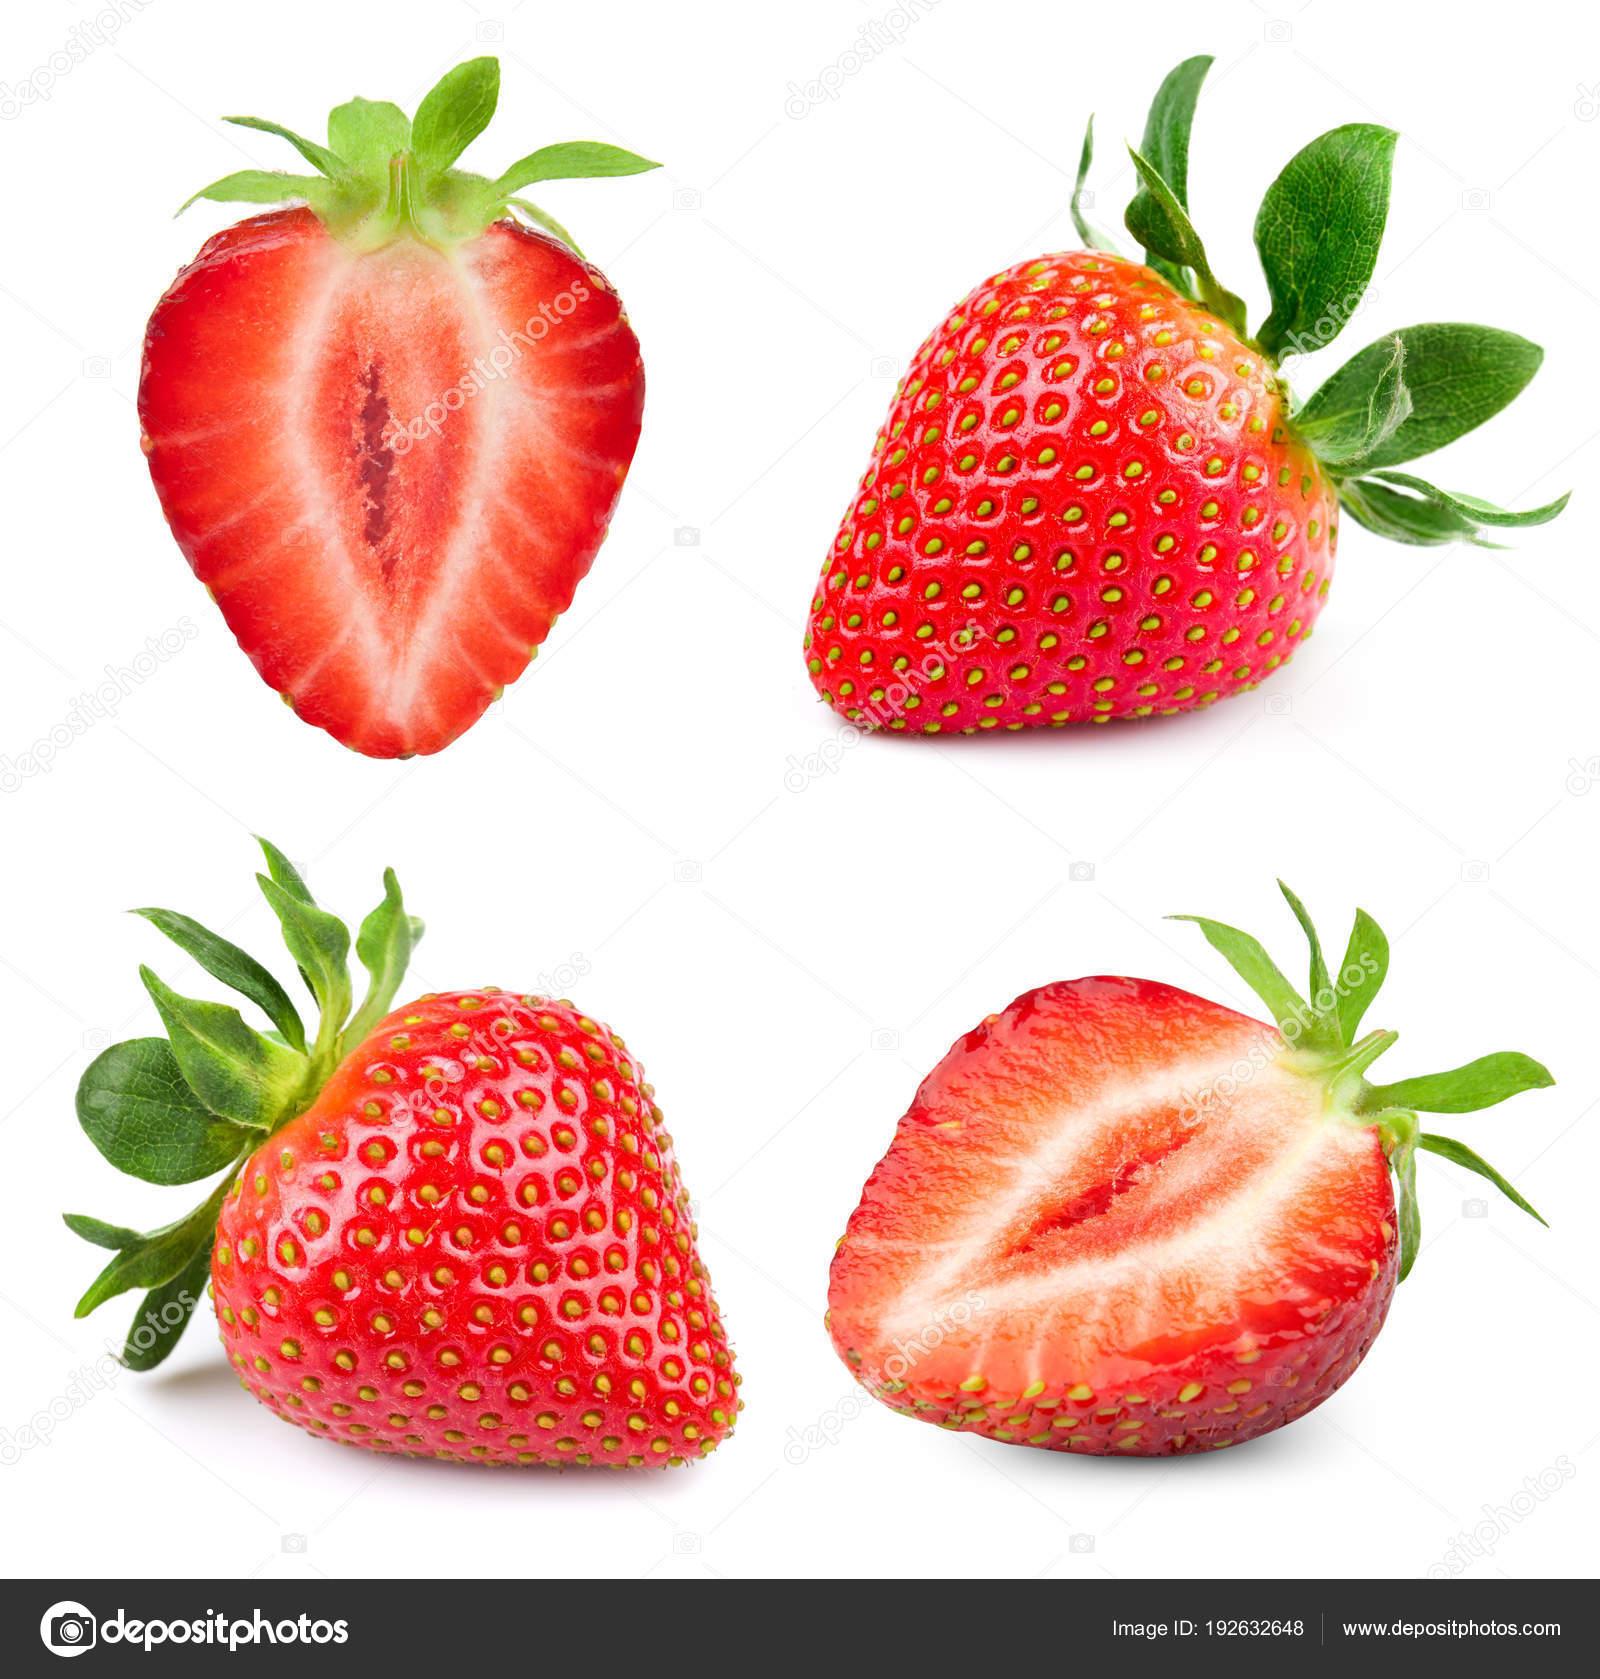 Strawberry Half Pictures